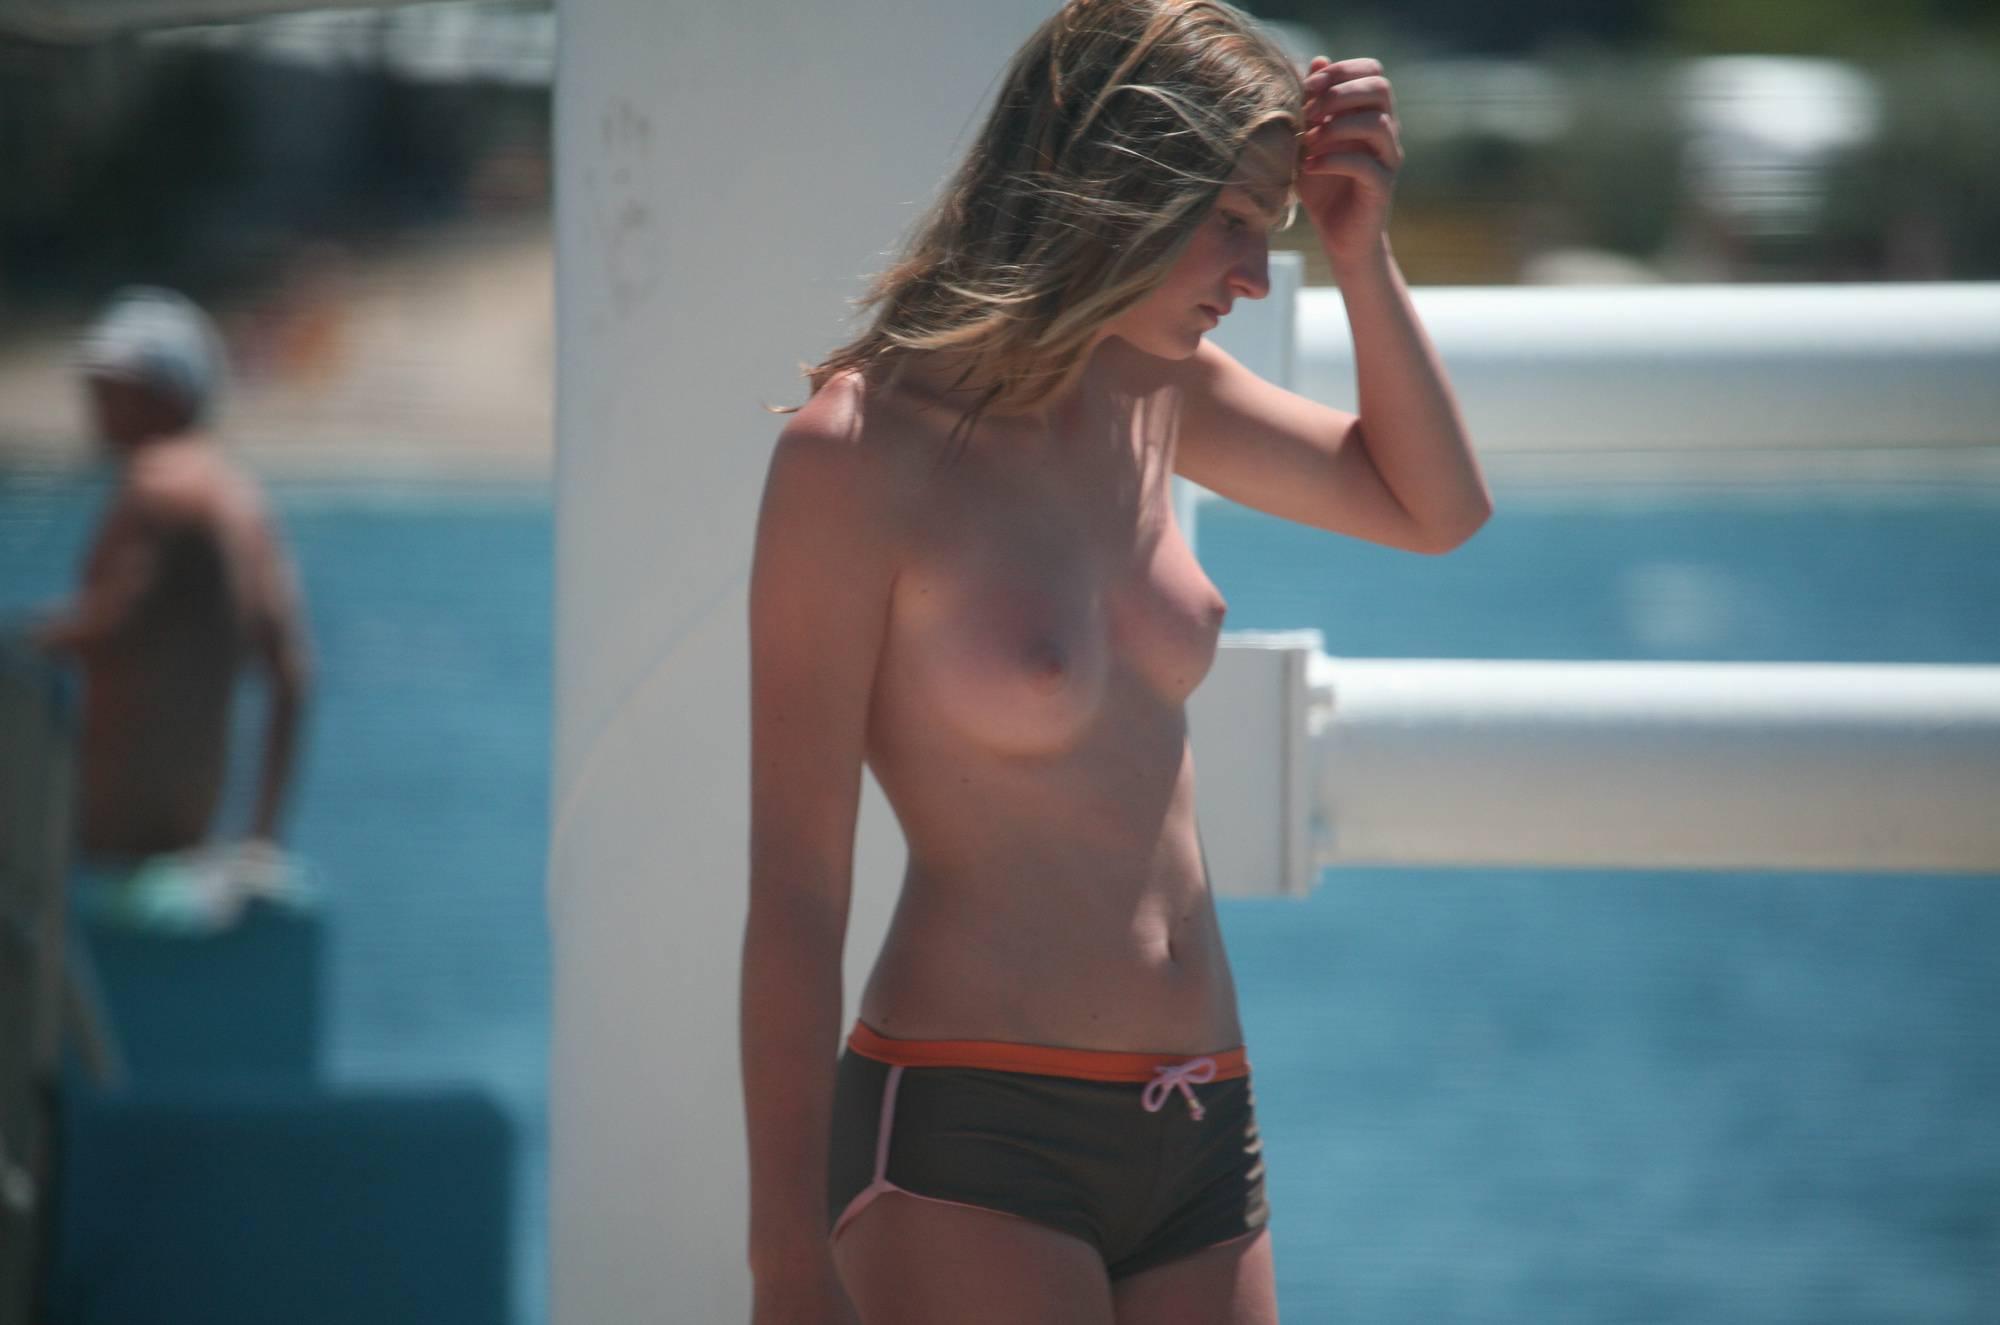 Nudist Gallery Nora FKK Nudist Beach Girl - 1